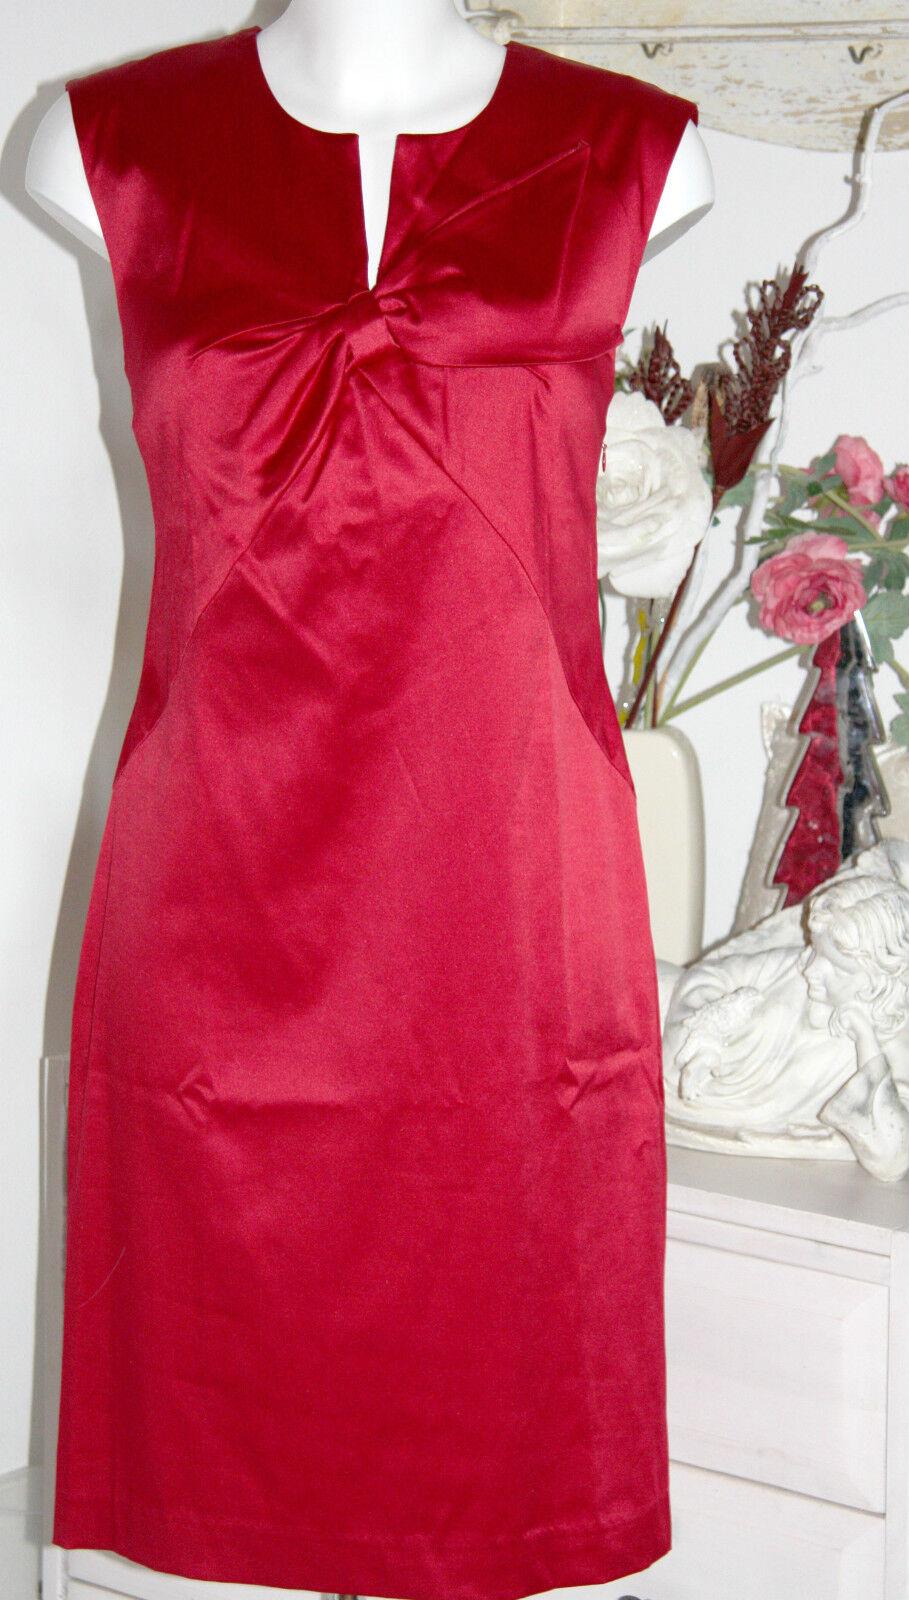 InWear Kleid Dress Etuikleid Dress rot Rhobee Größe  40 Neu